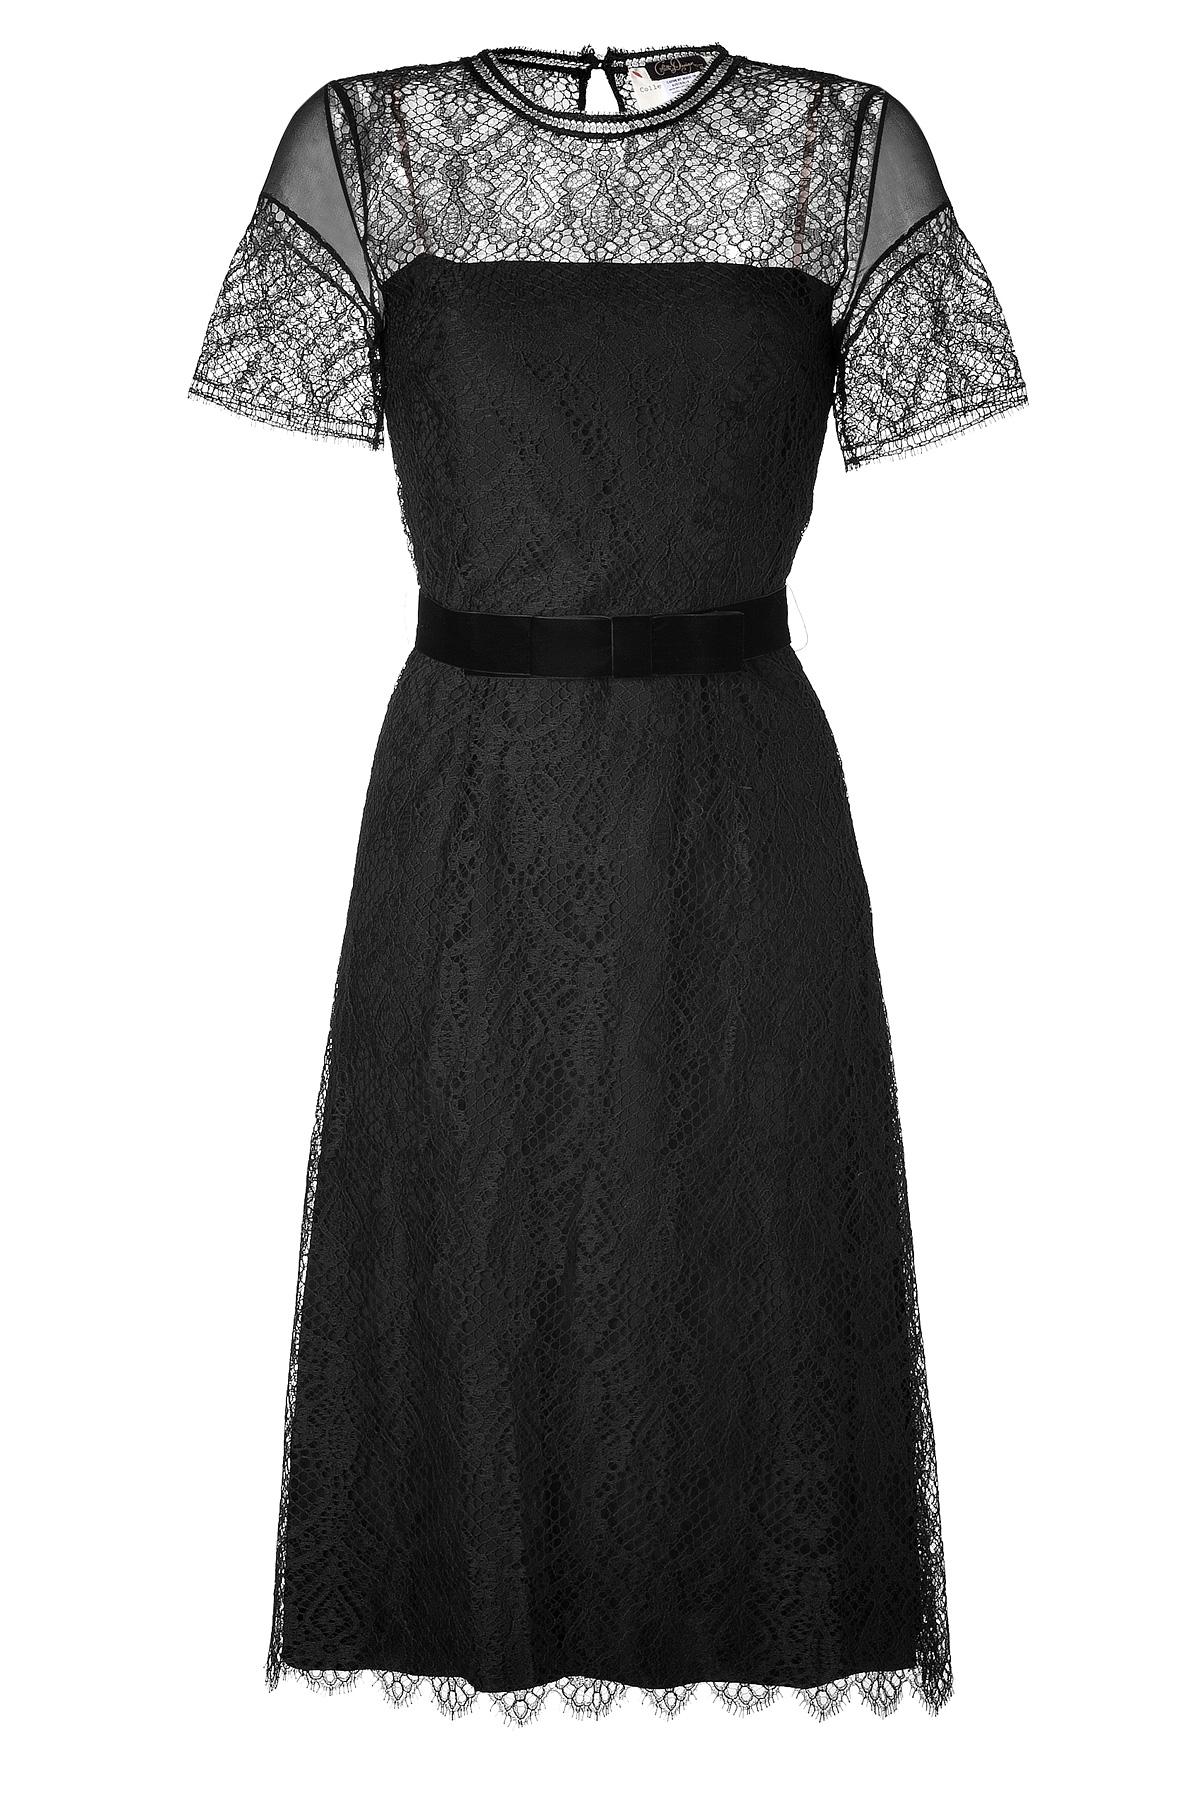 Stylebop Collette Dinnagan Fern Lace Dress